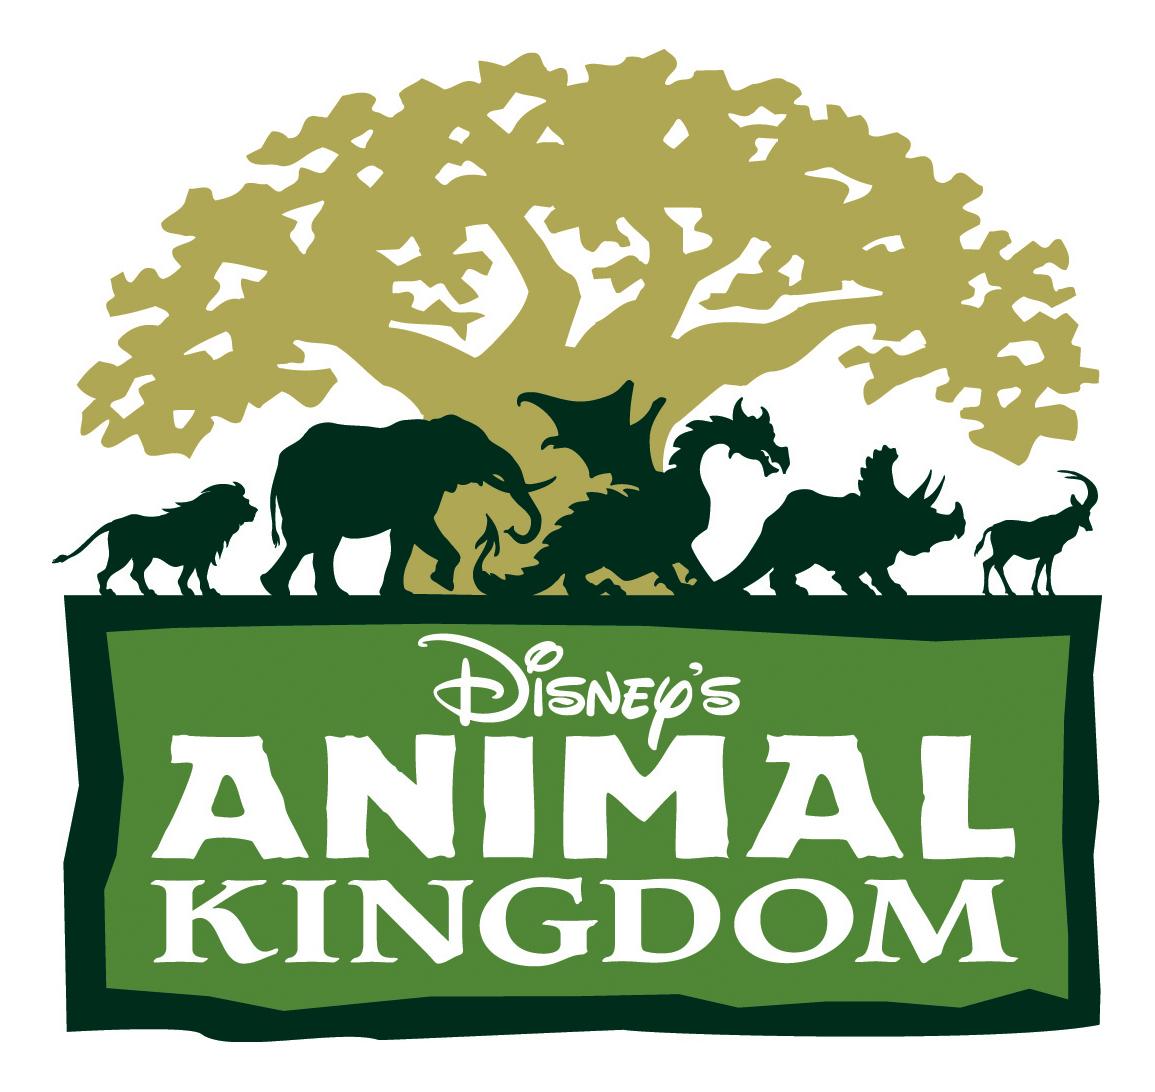 Disney kingdom clipart image download Disney Magic Kingdom Clipart - Clipart Kid image download